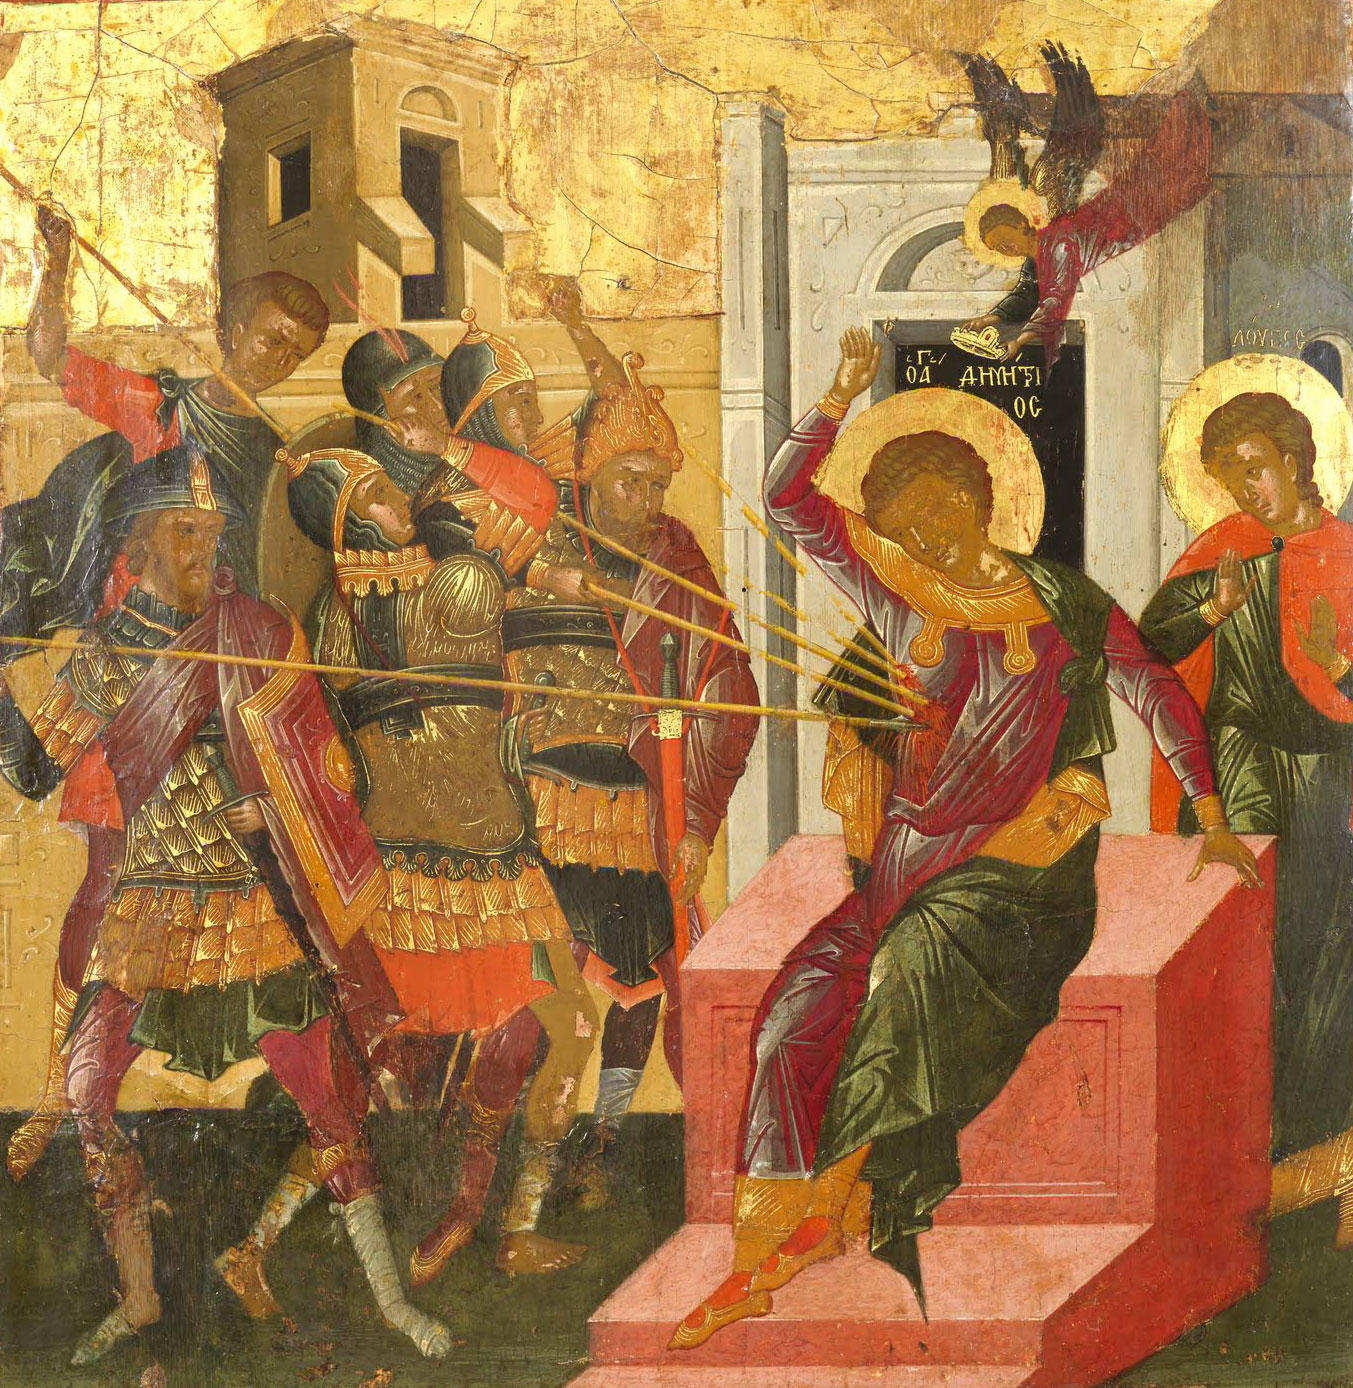 Martiriul Sfantului Dimitrie in iconografie